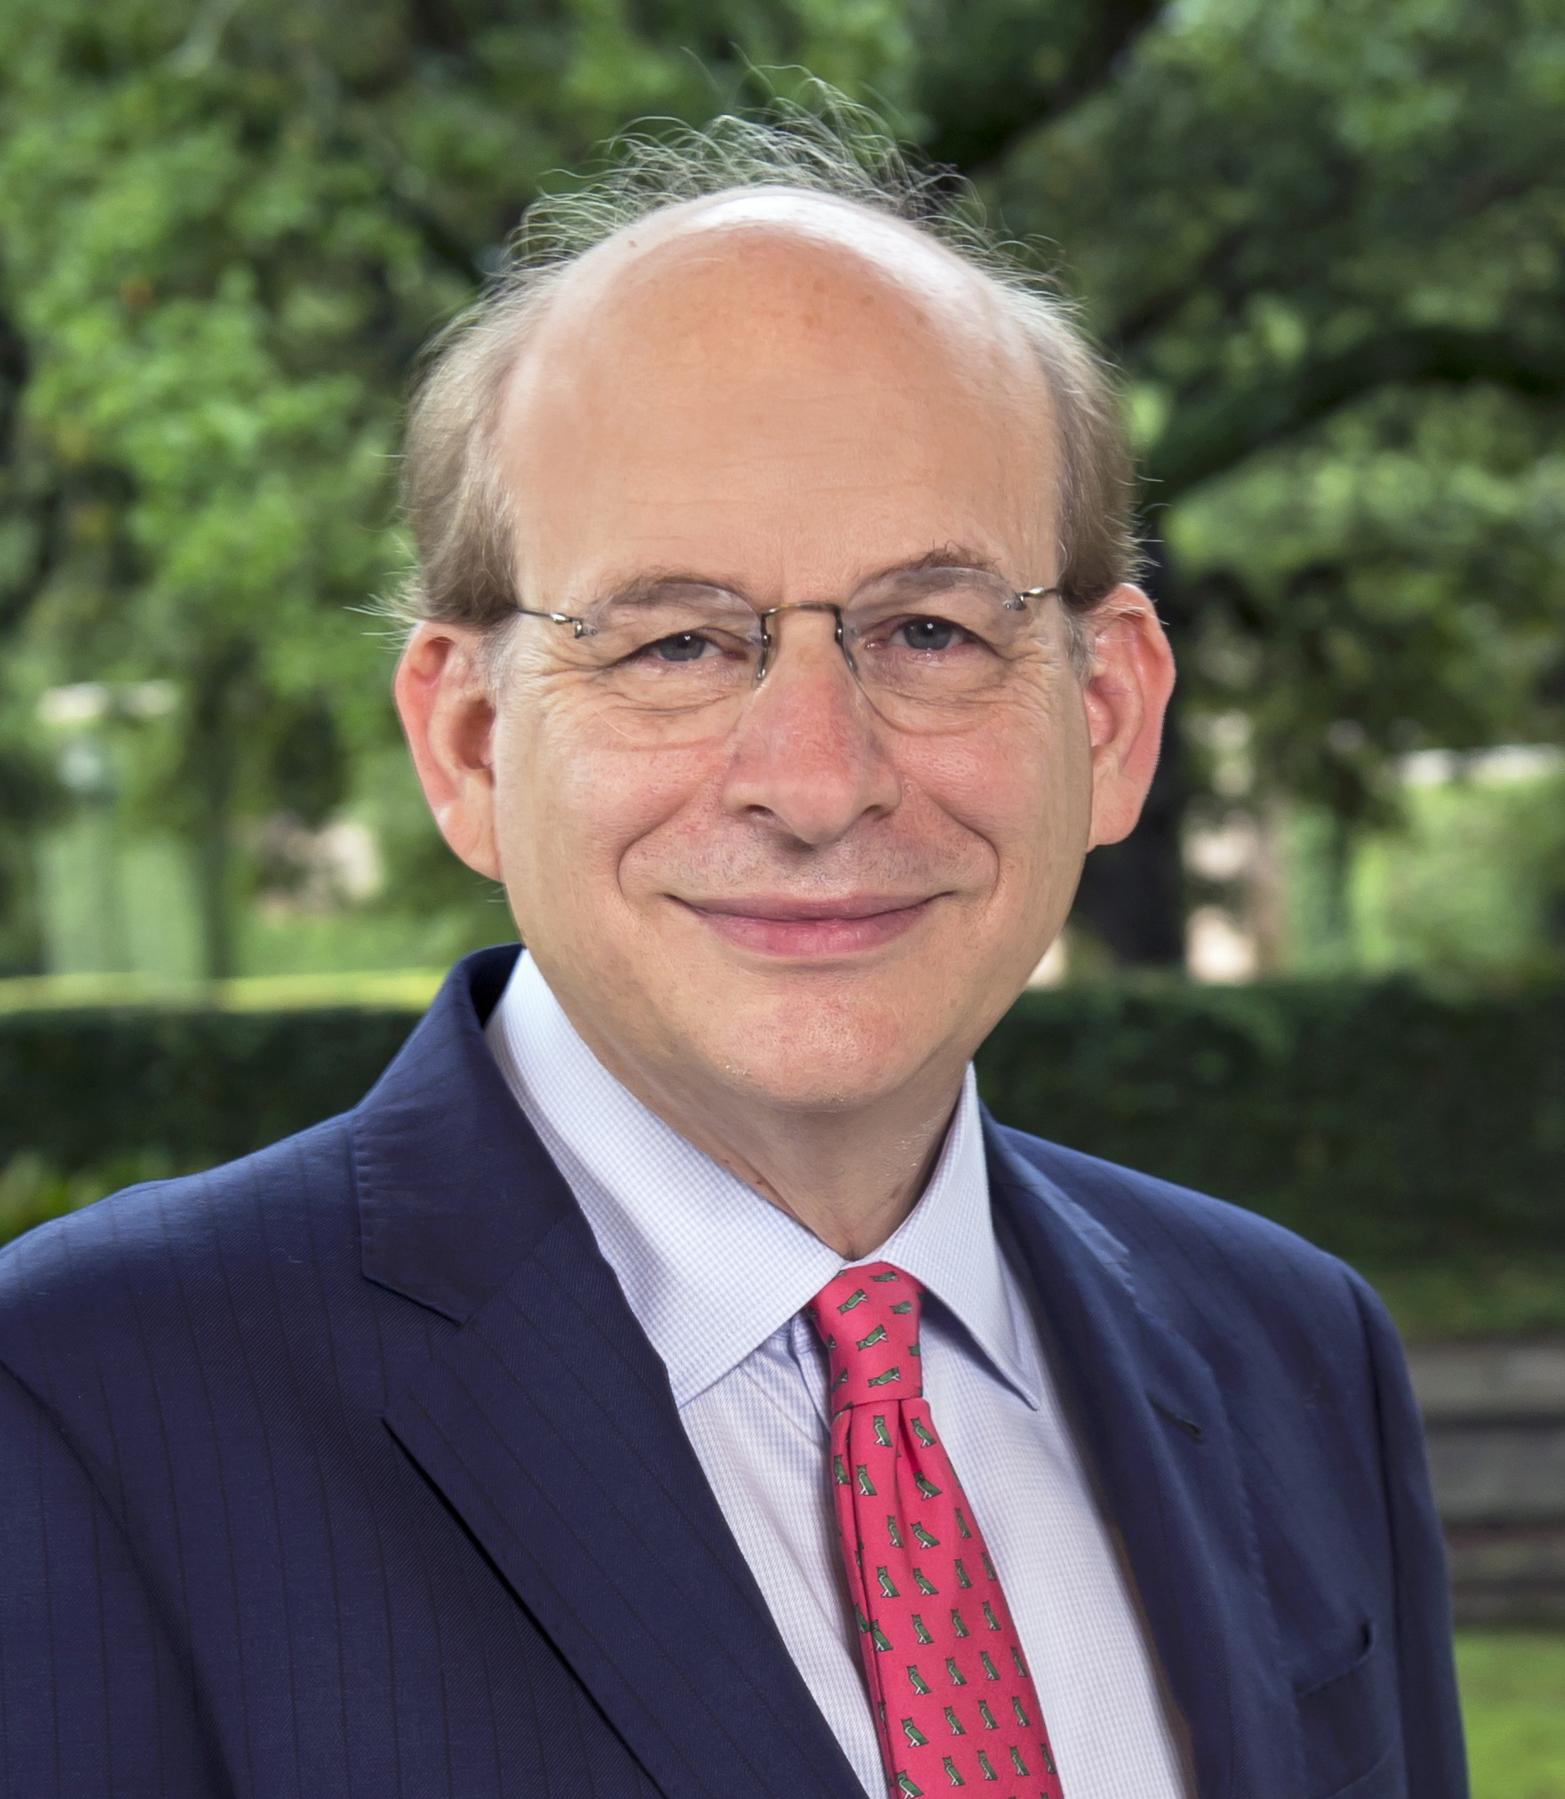 David Leebron, Presidente de Rice University